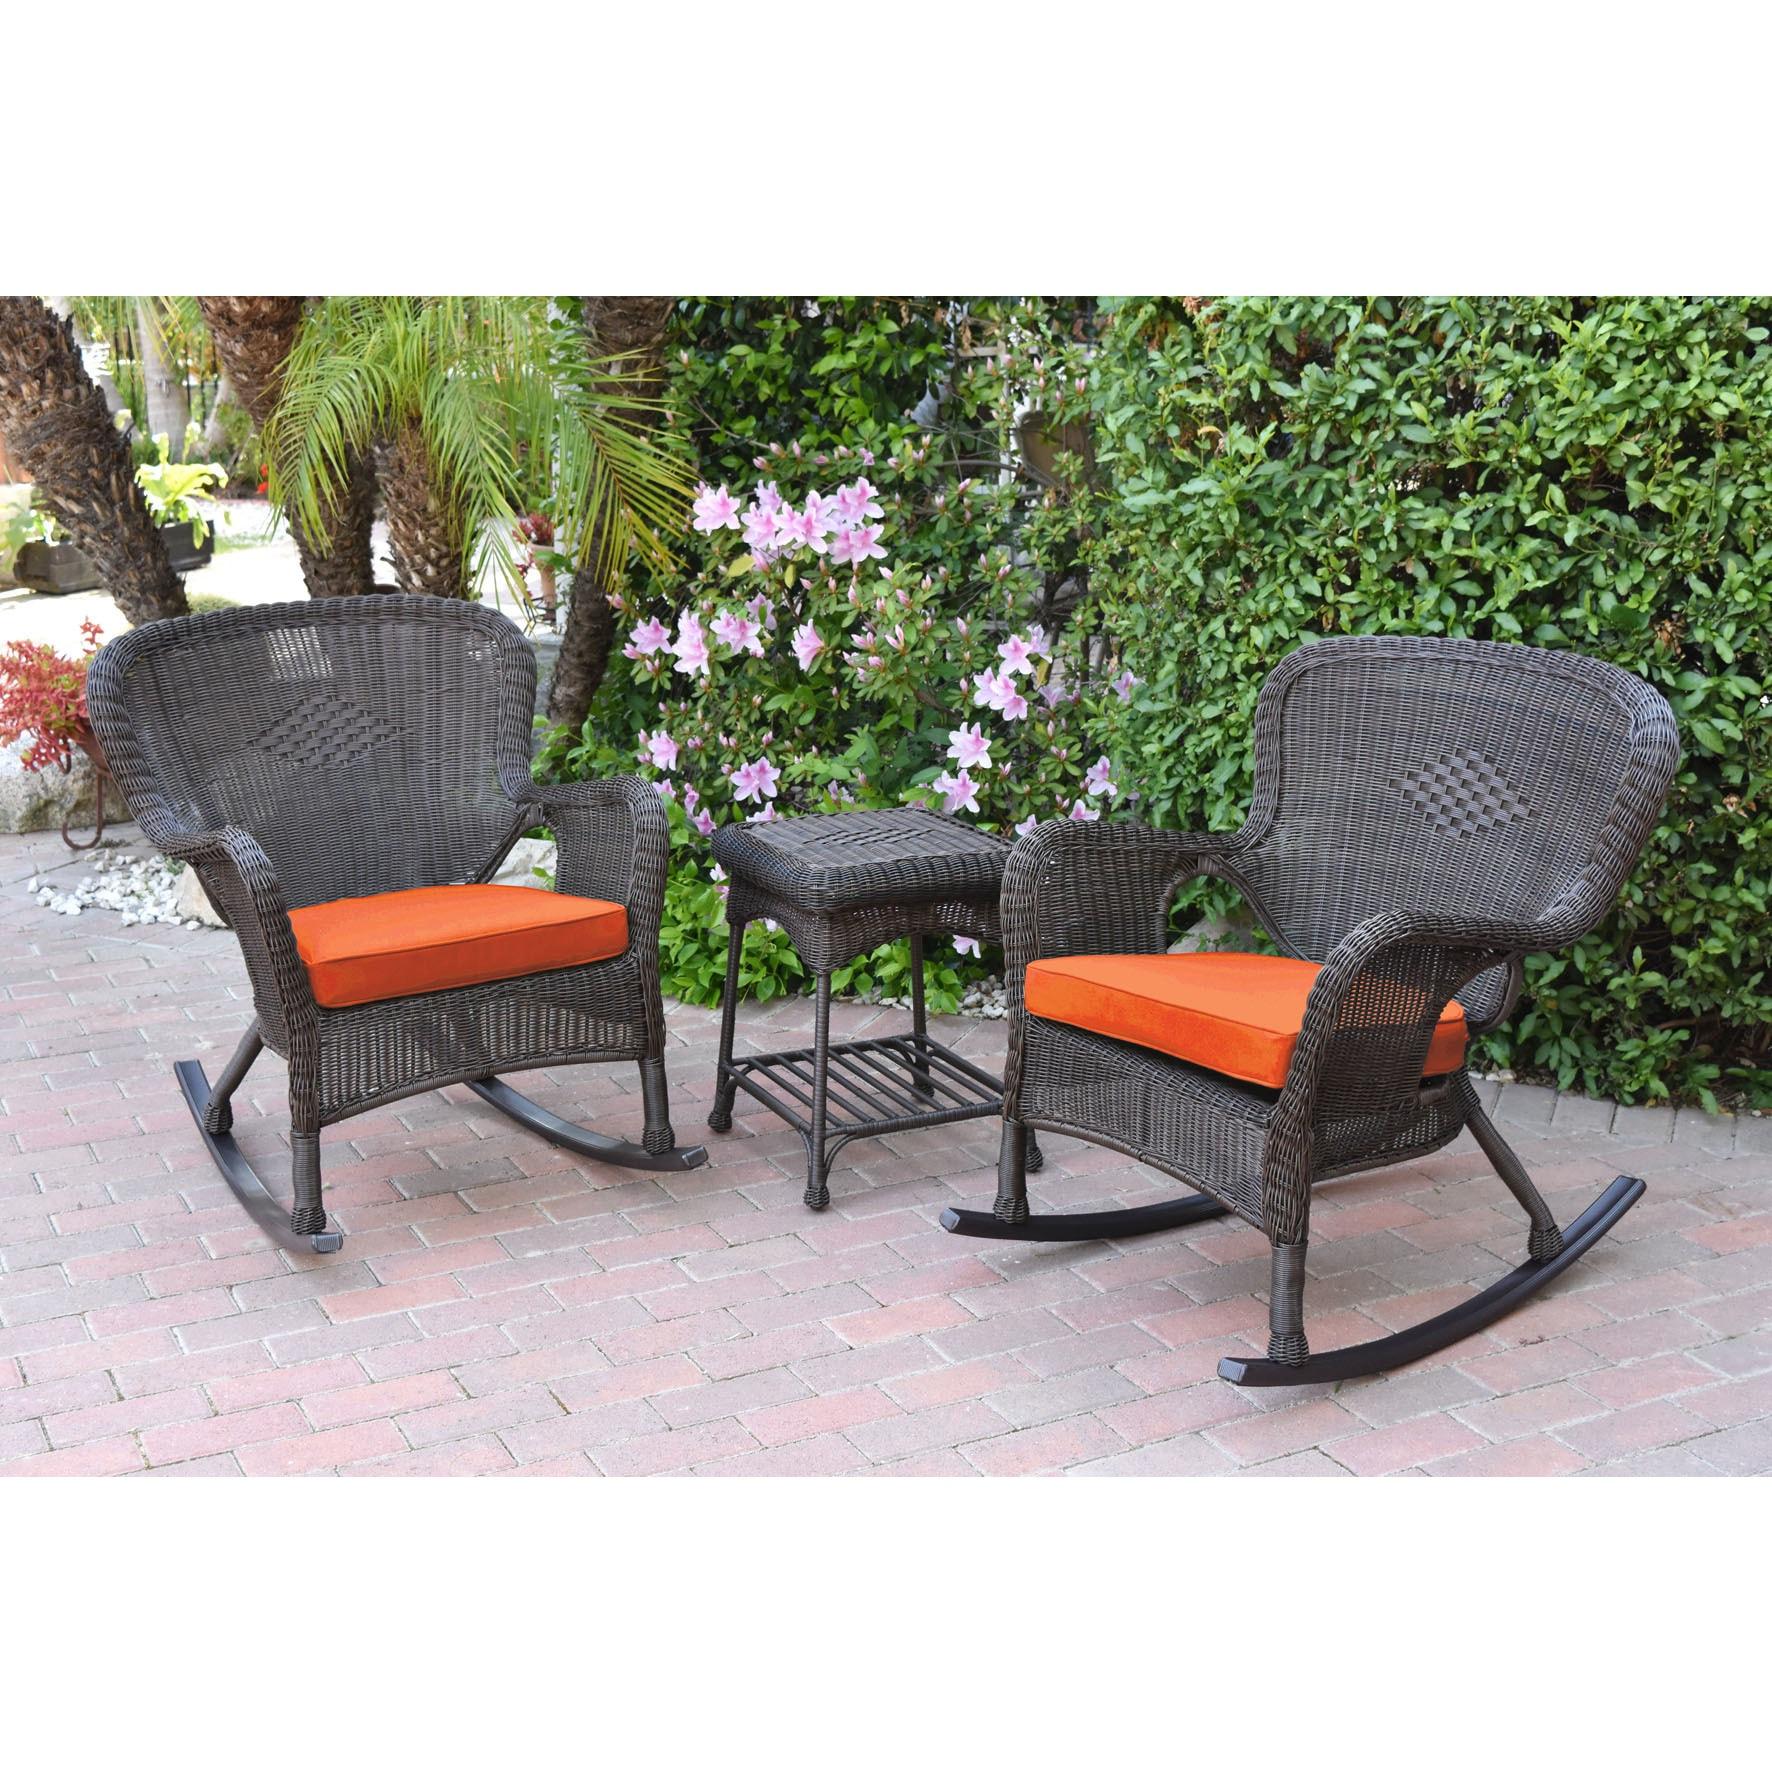 Jeco Windsor Espresso Wicker Rocker Wicker Chair And End Table Set